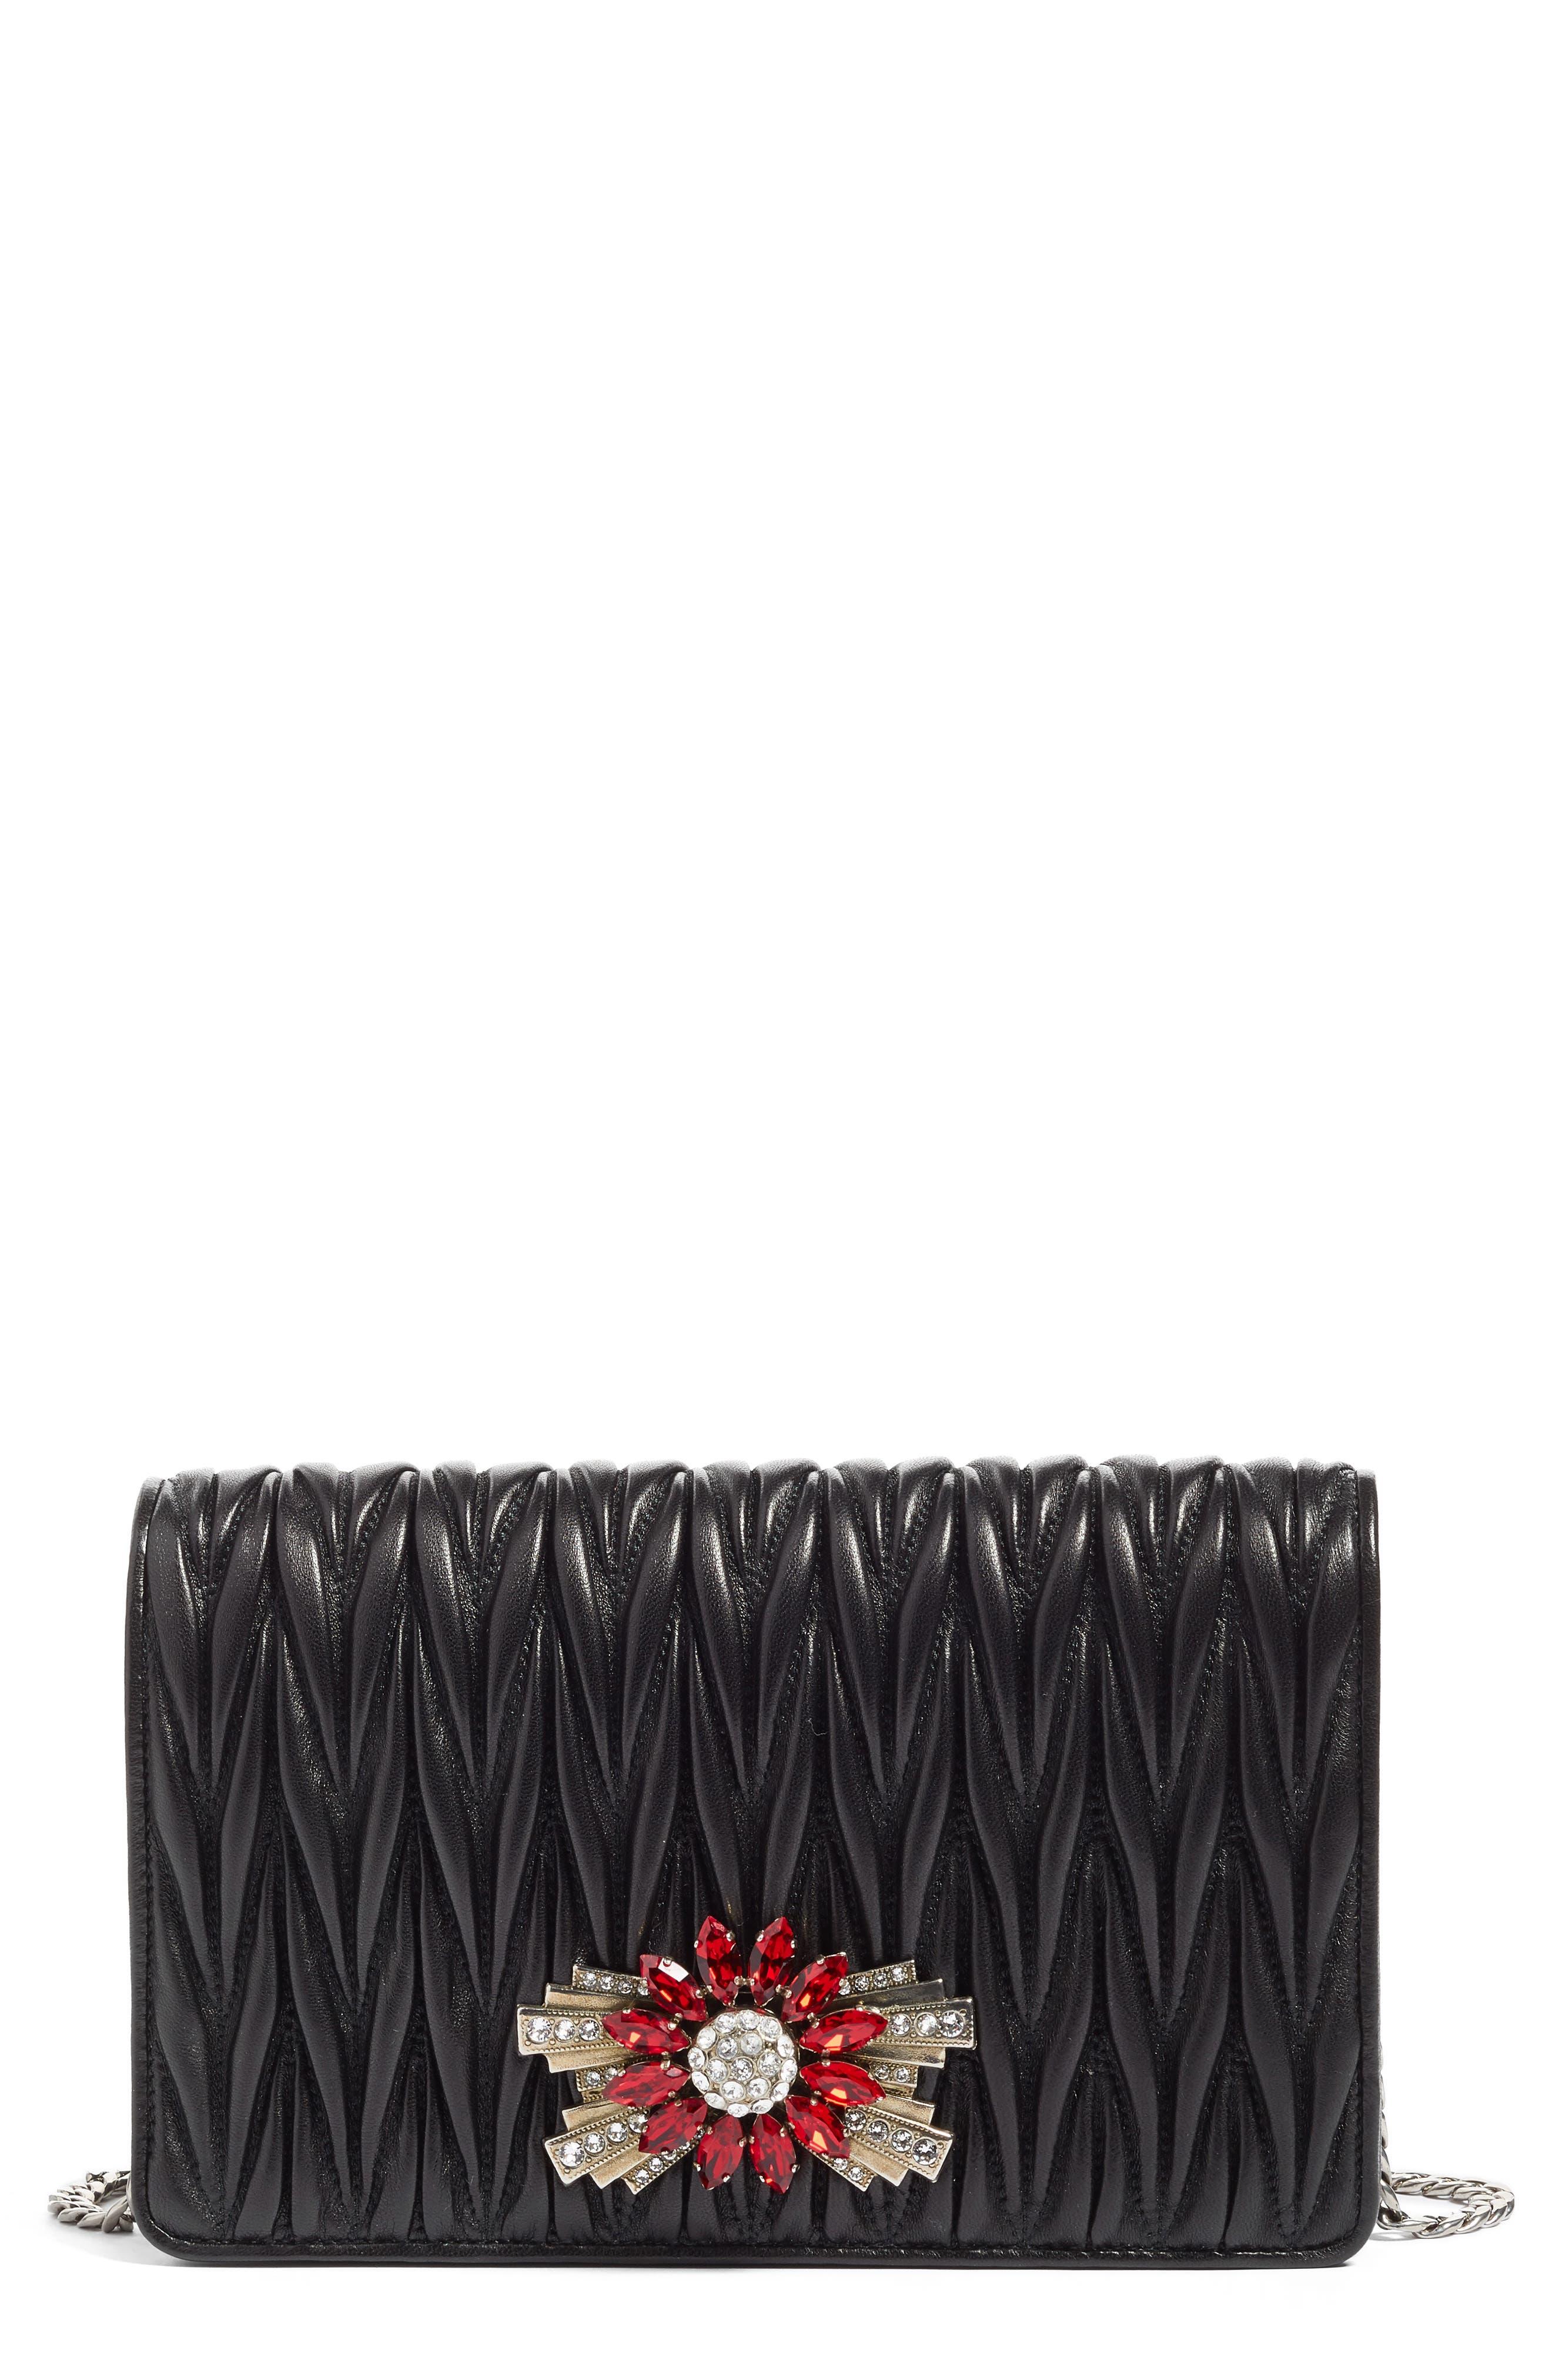 Miu Miu Delice Matelassé Leather Wallet on a Chain